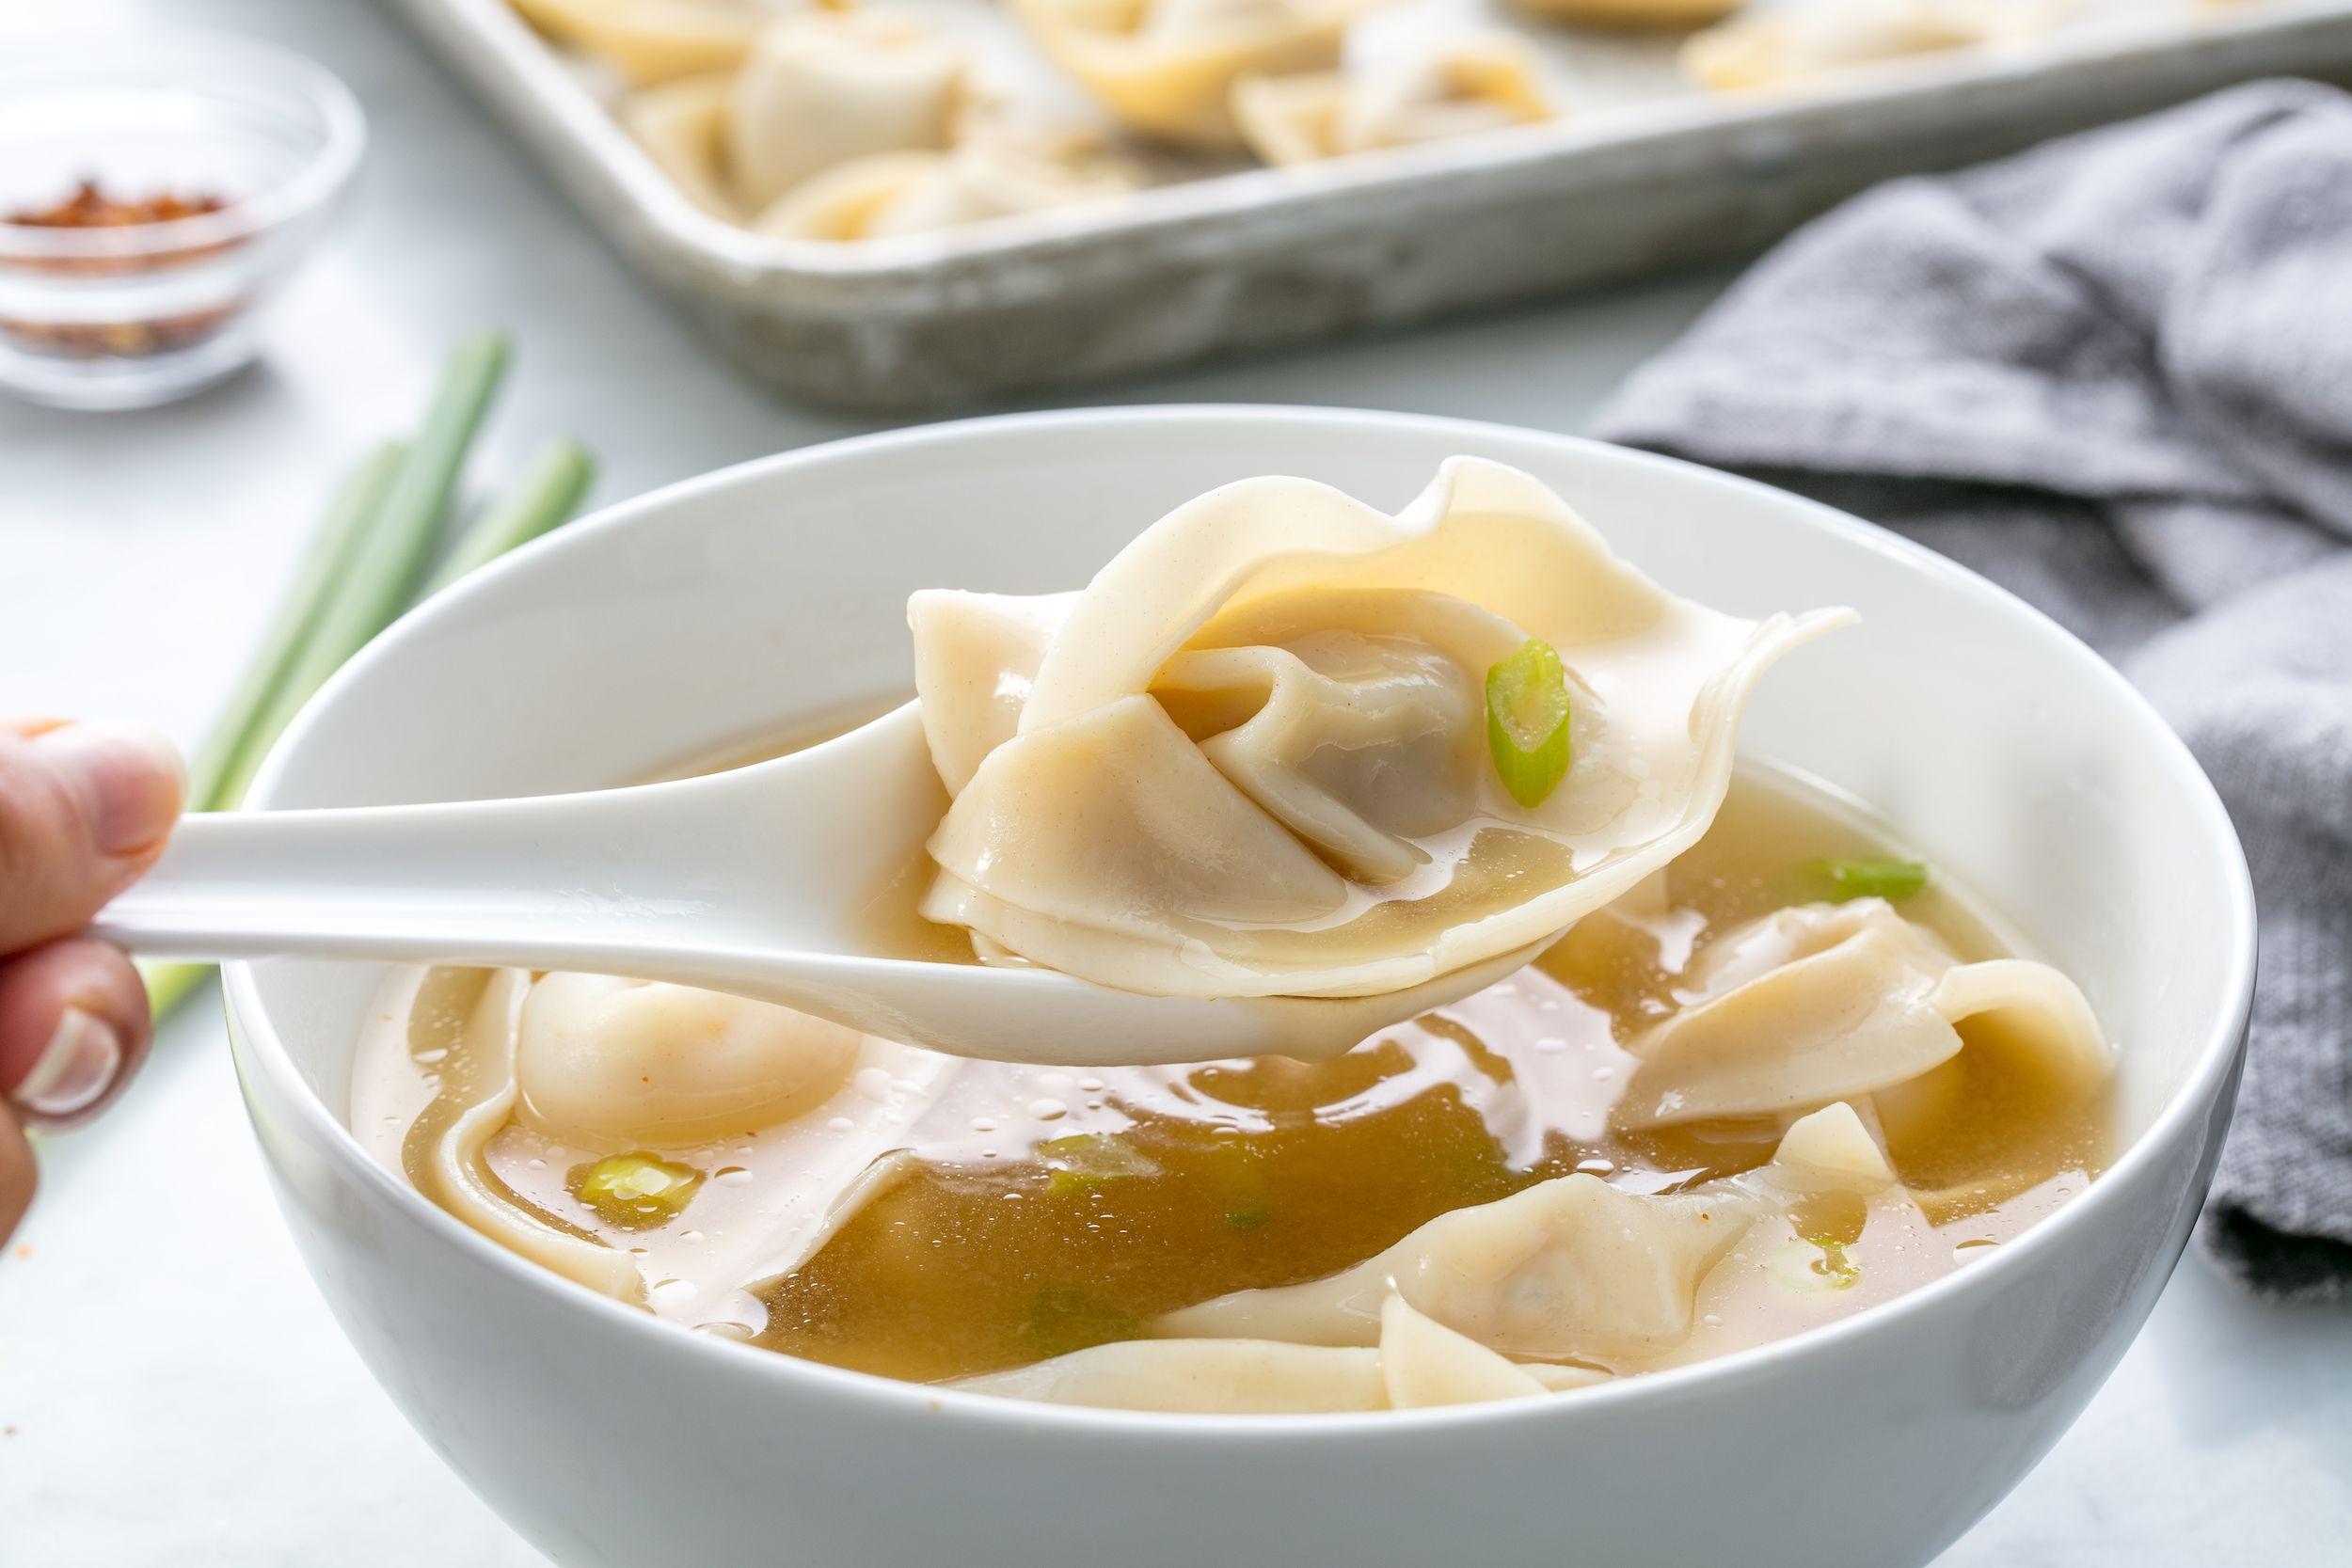 Easy Wonton Soup Recipe - How to Make Wonton Soup